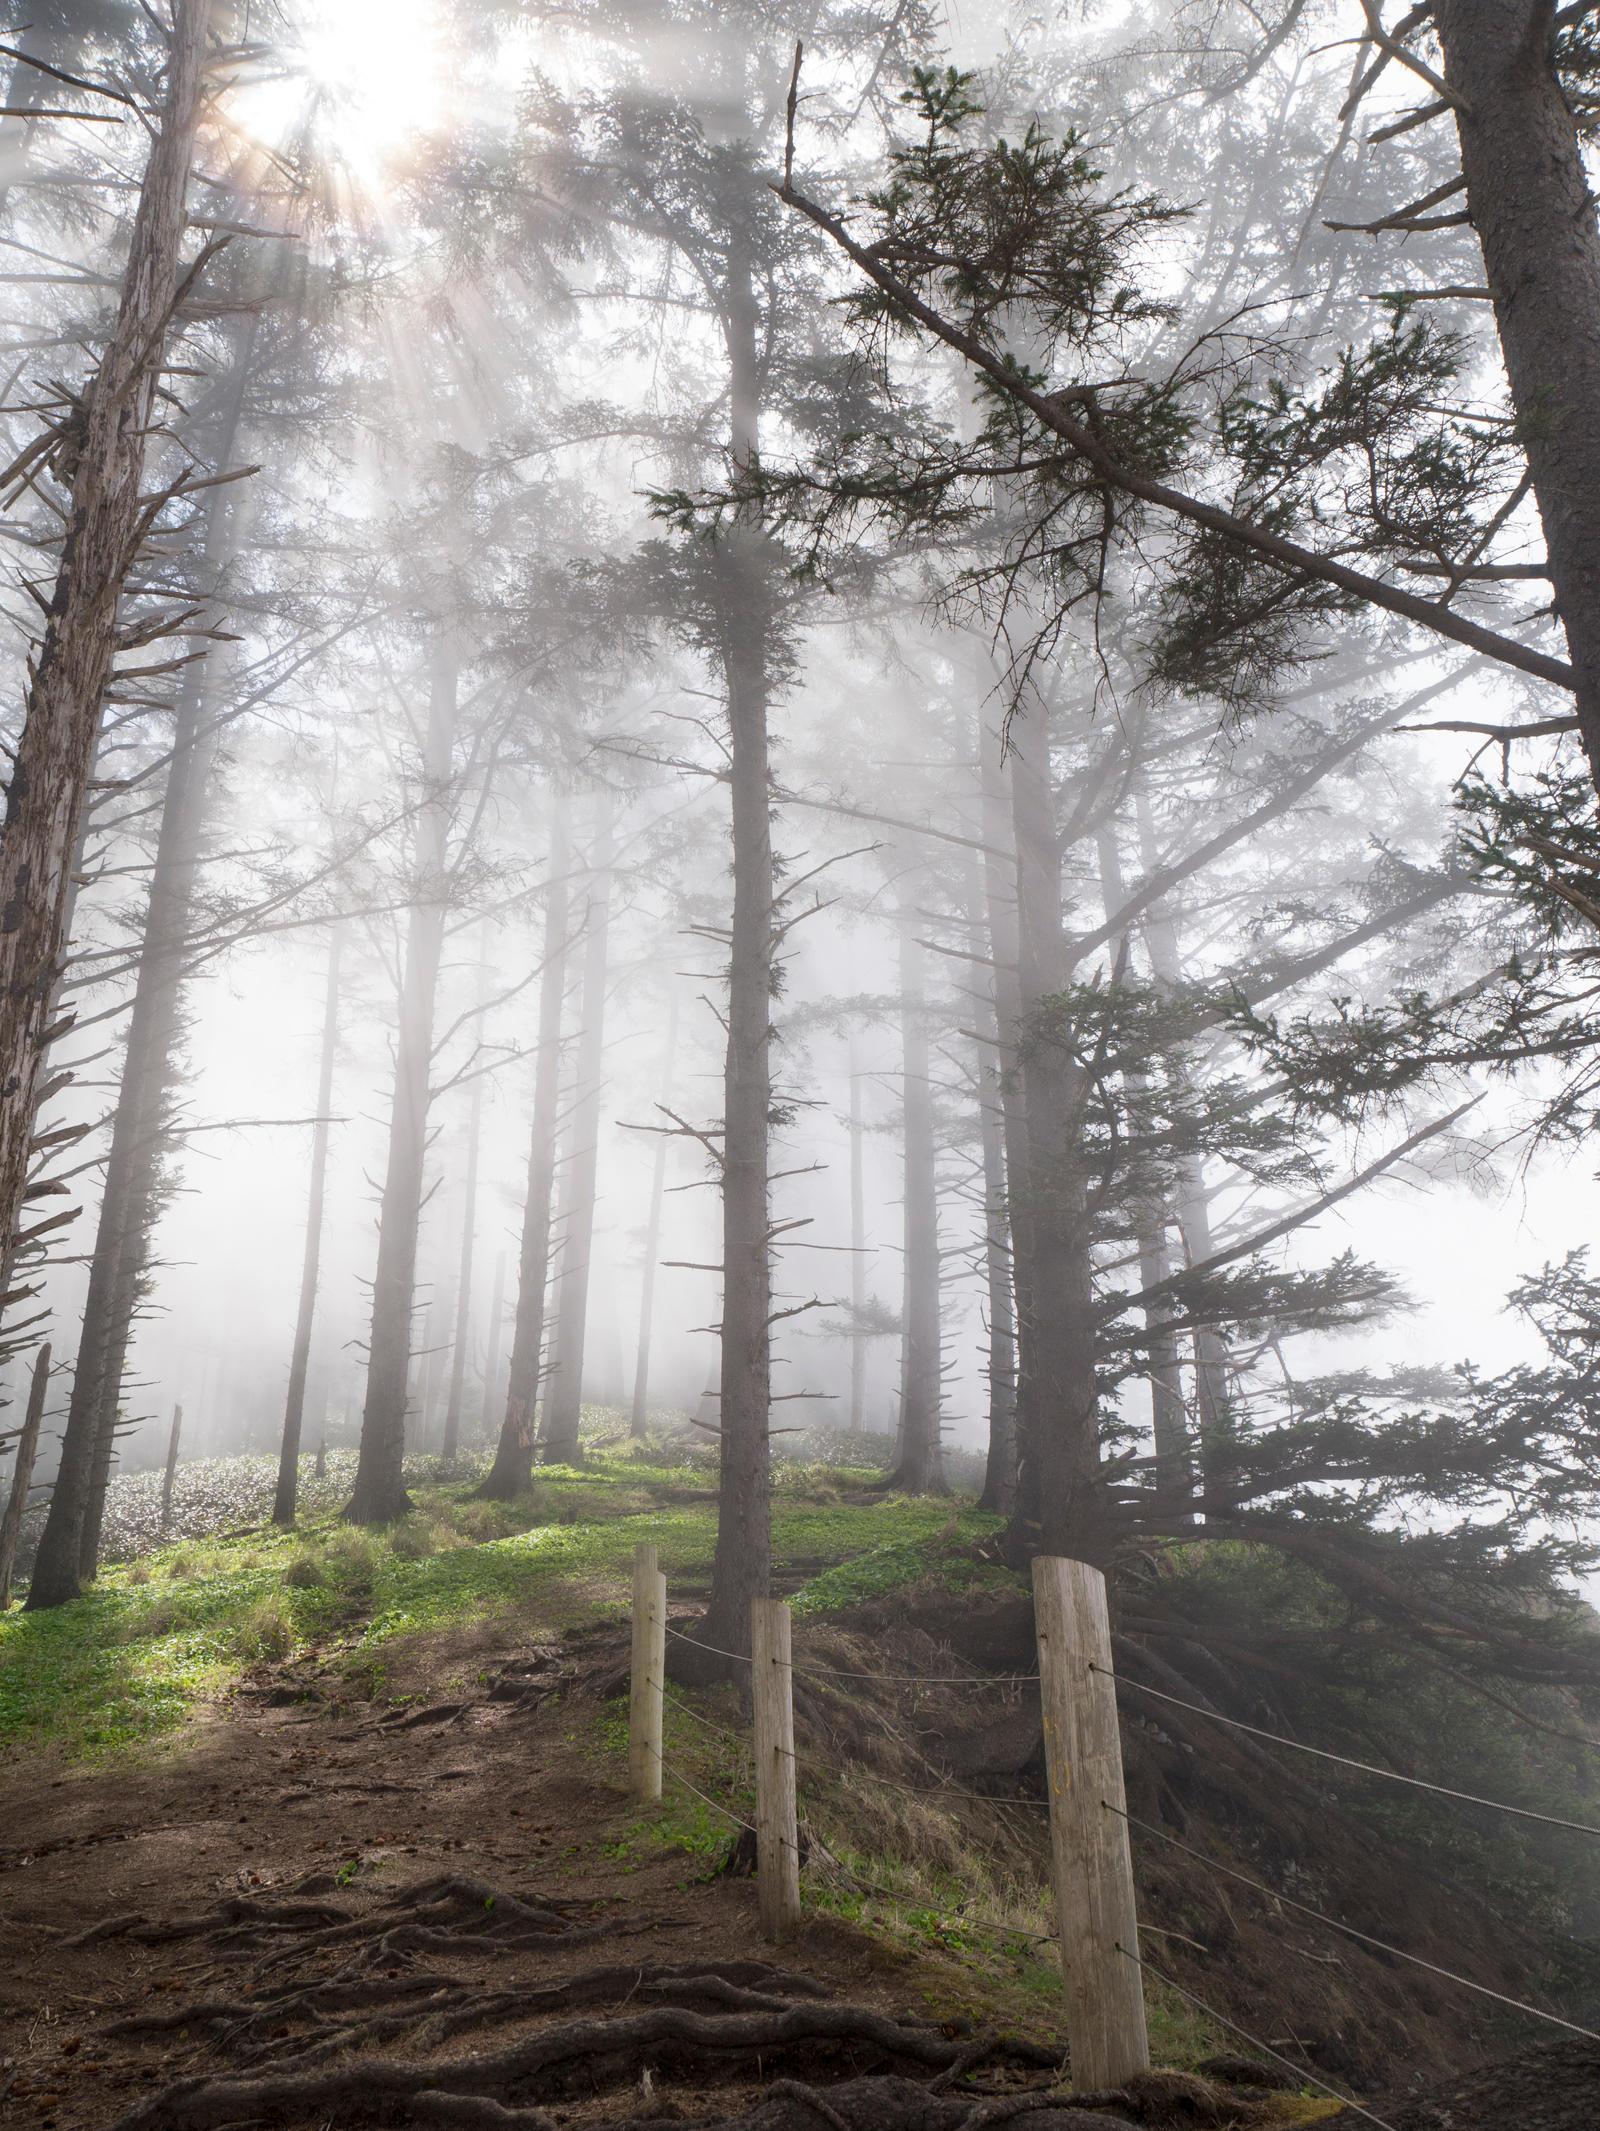 Misty Trail by the3dman